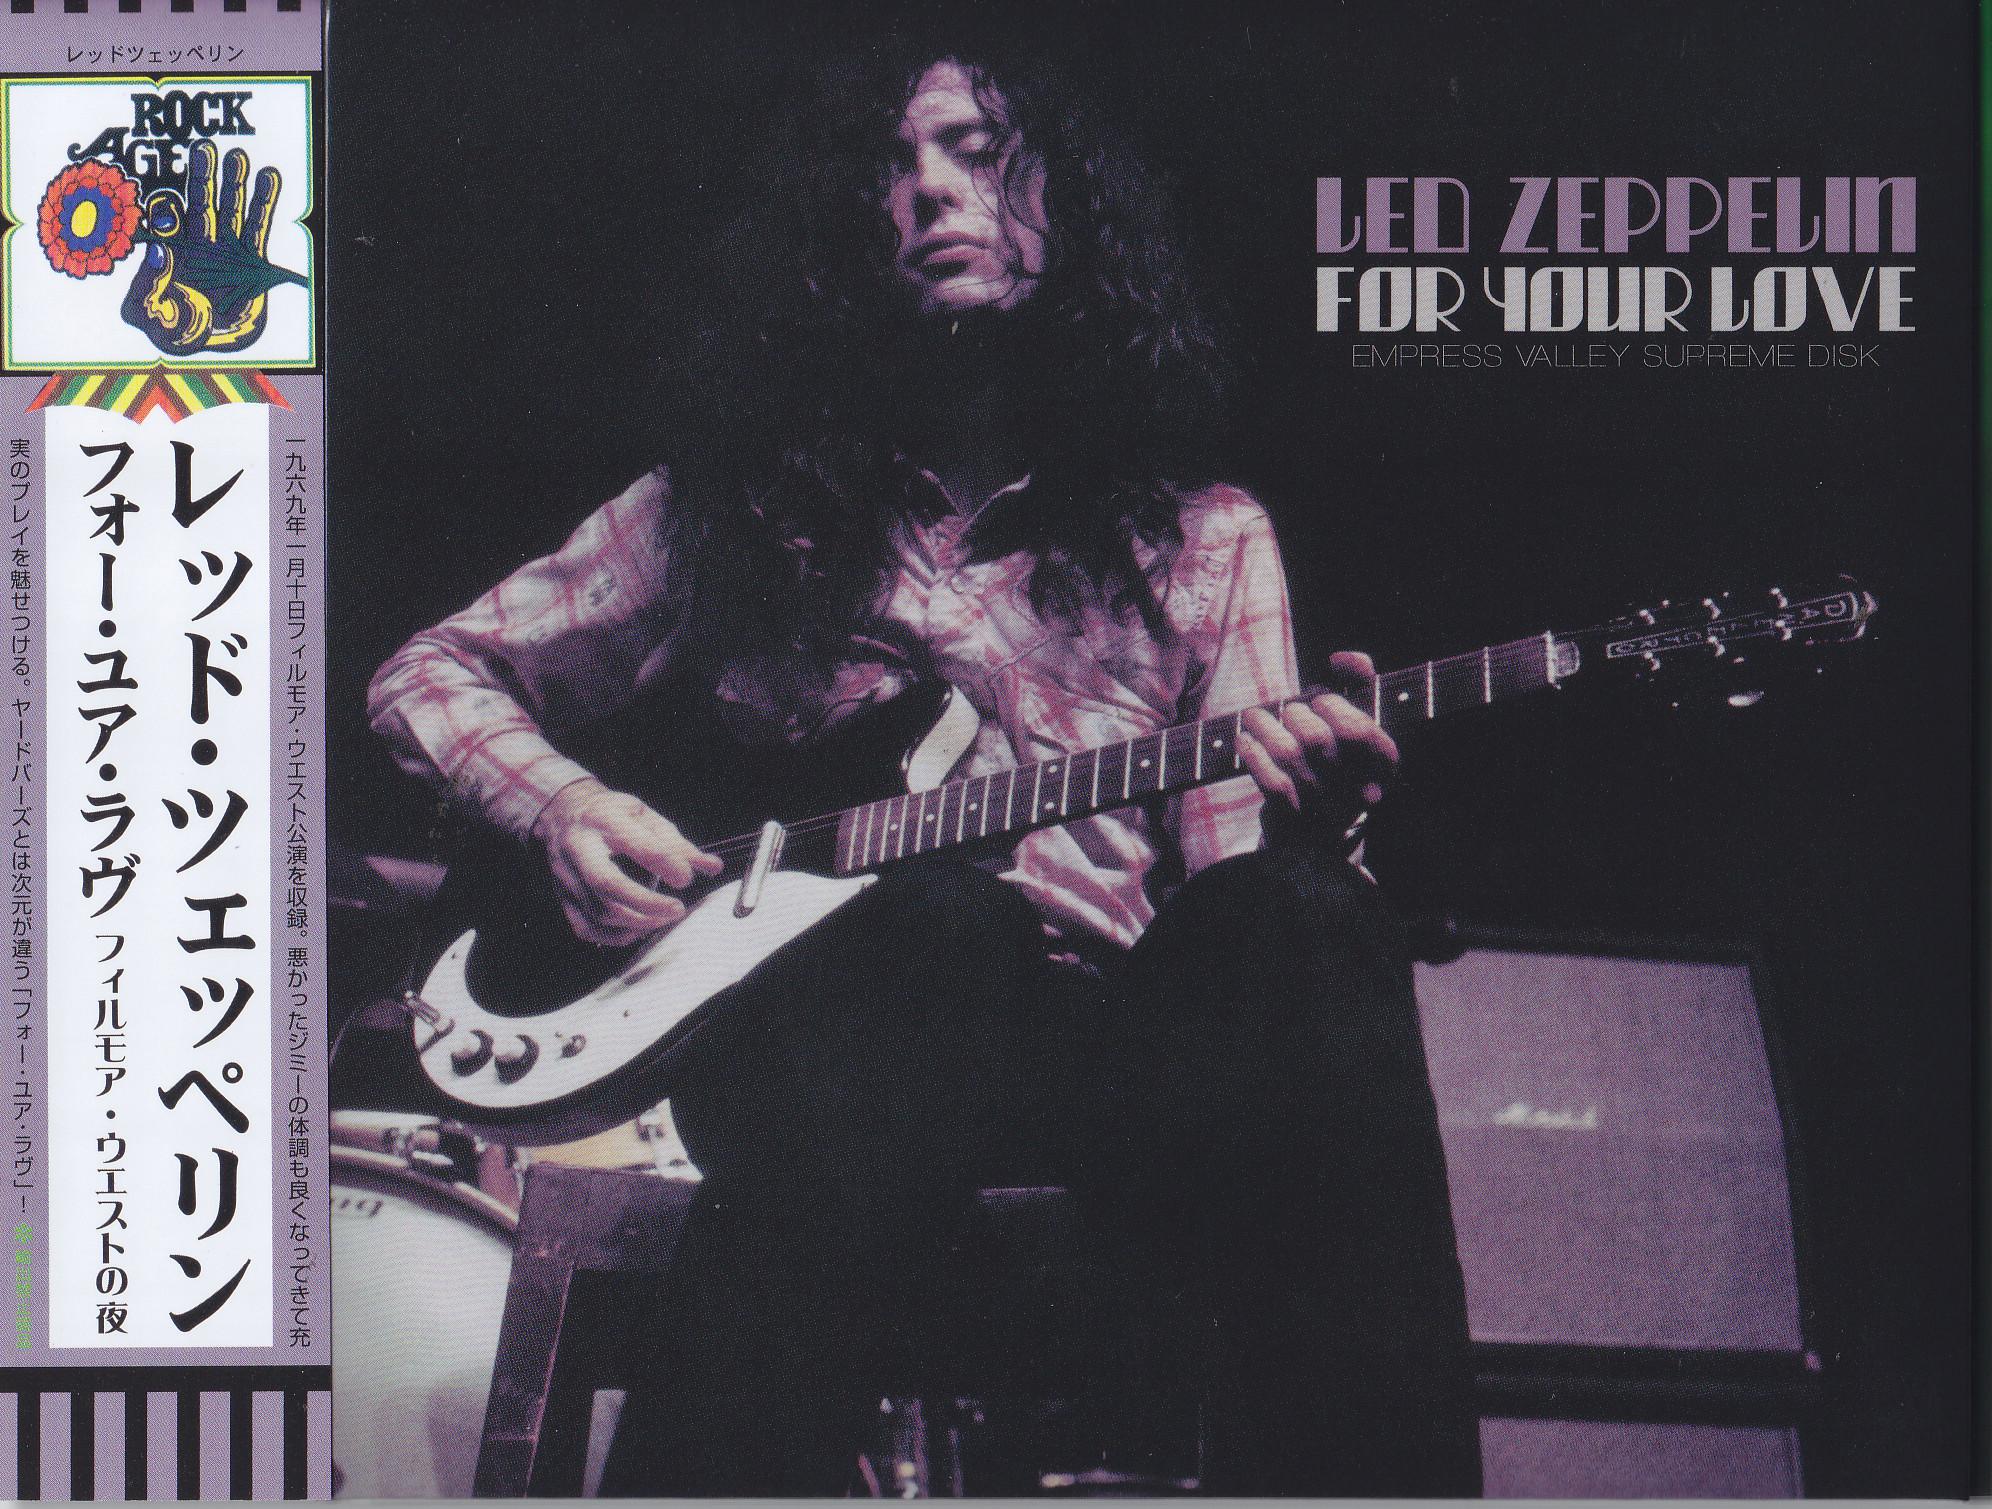 Led Zeppelin-For Your Love (2CD Digipak With OBI Strip) Empress Valley  Supreme Disk  EVSD-414/415